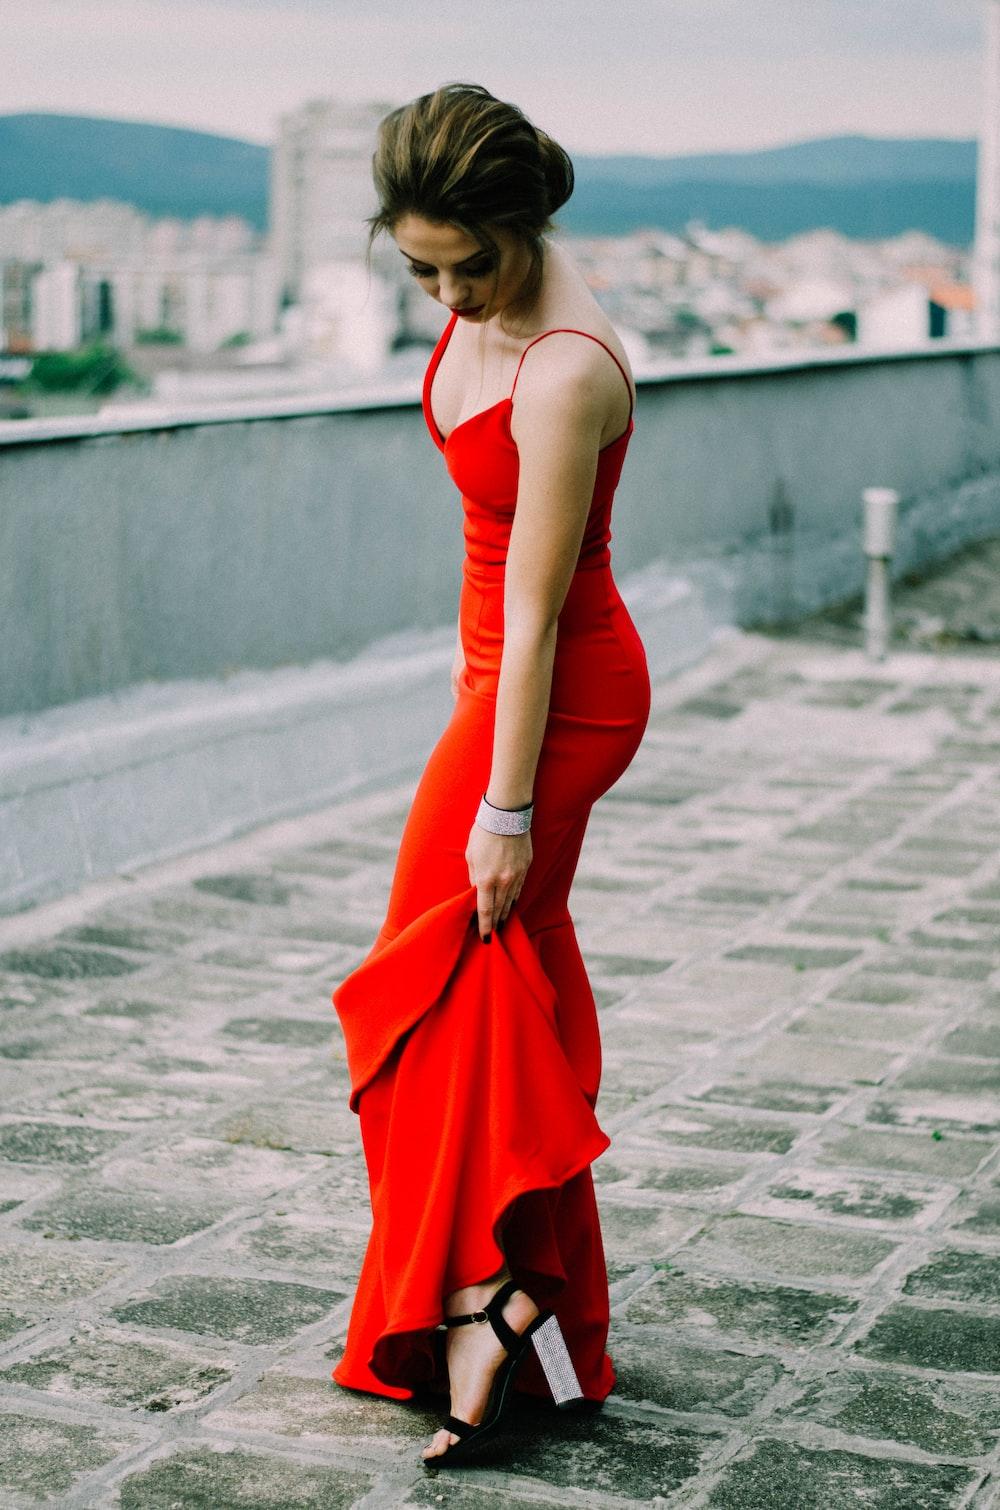 500 Dress Pictures Download Free Images On Unsplash